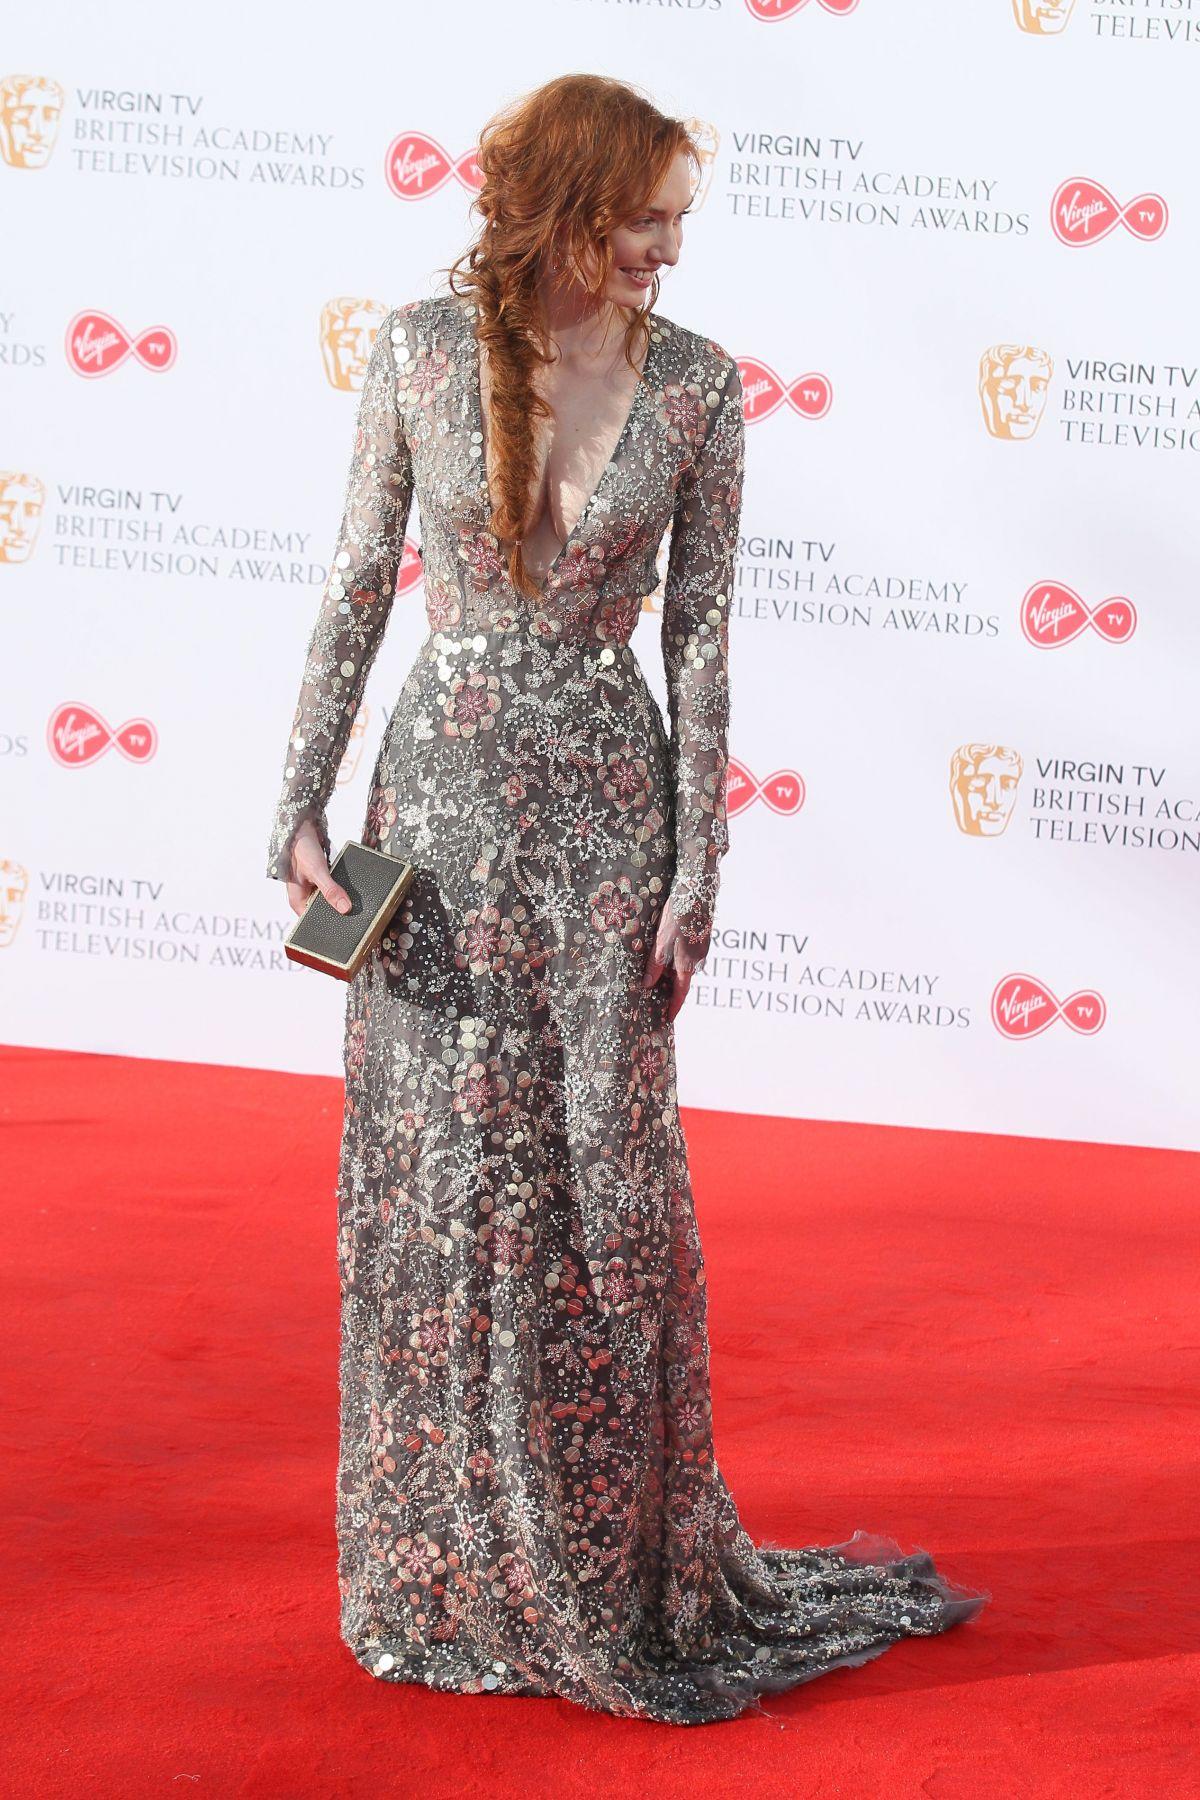 ELEANOR TOMLINSON at 2017 British Academy Television